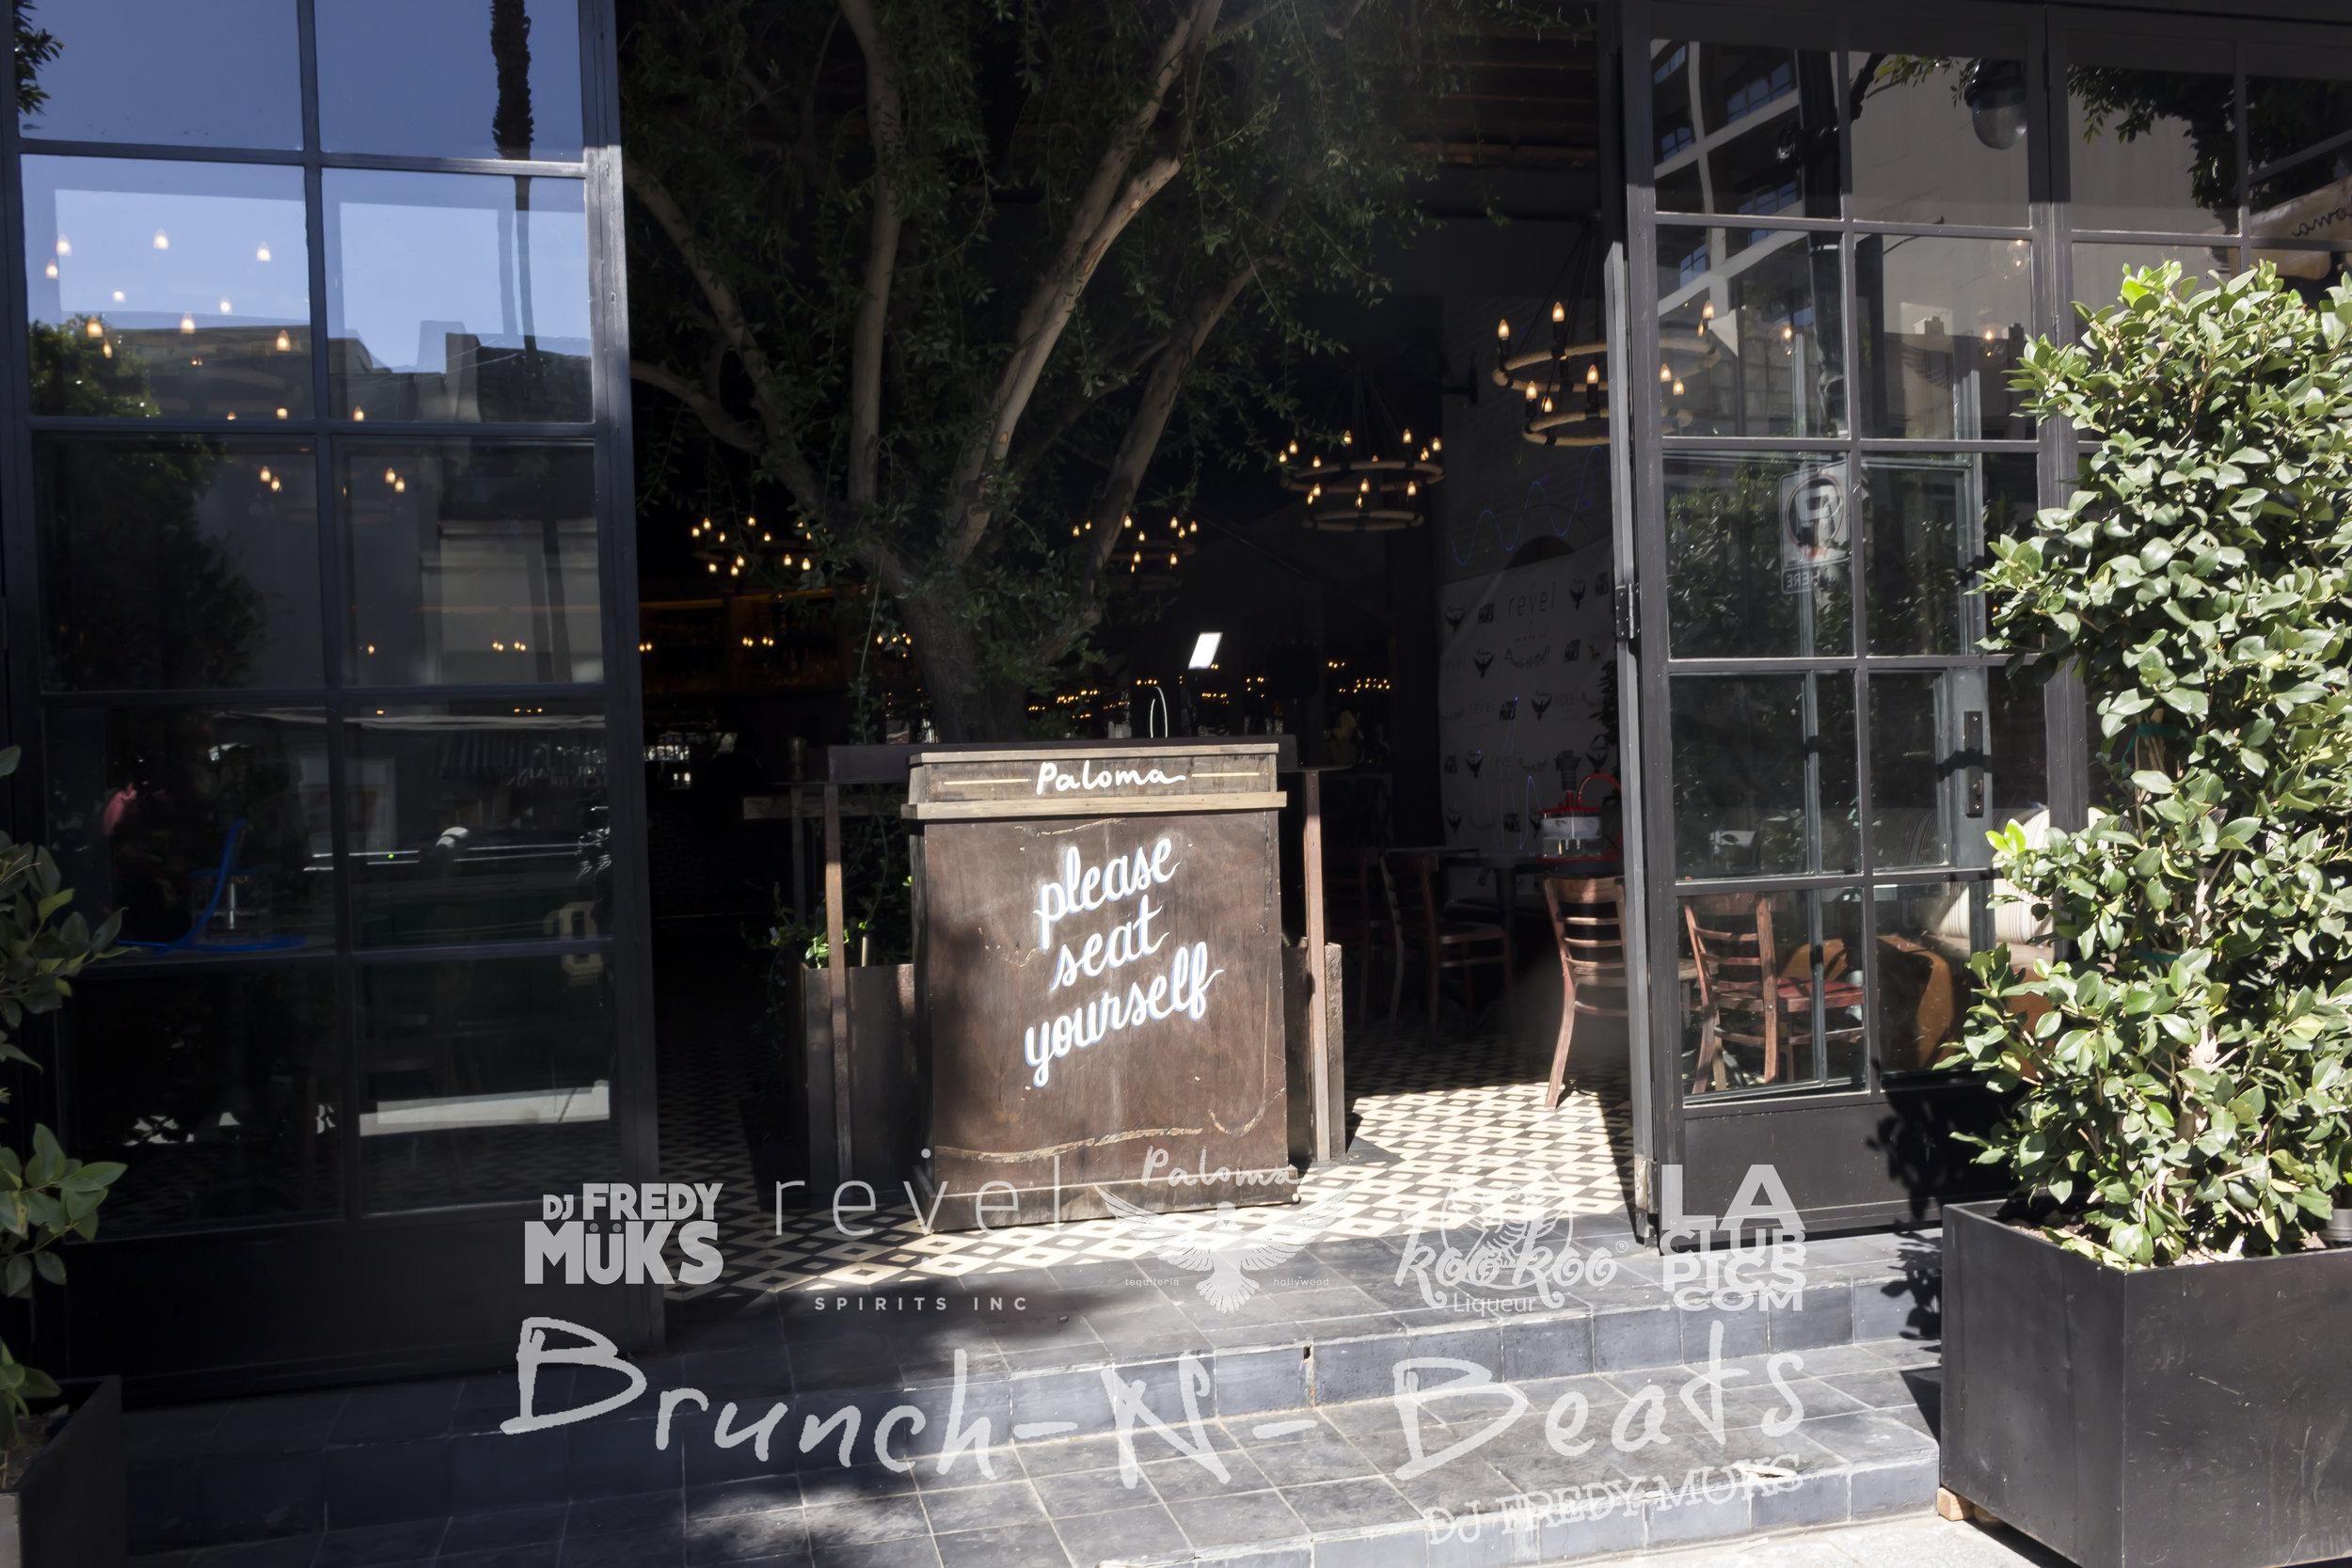 Brunch-N-Beats - Paloma Hollywood - 02-25-18_17.jpg